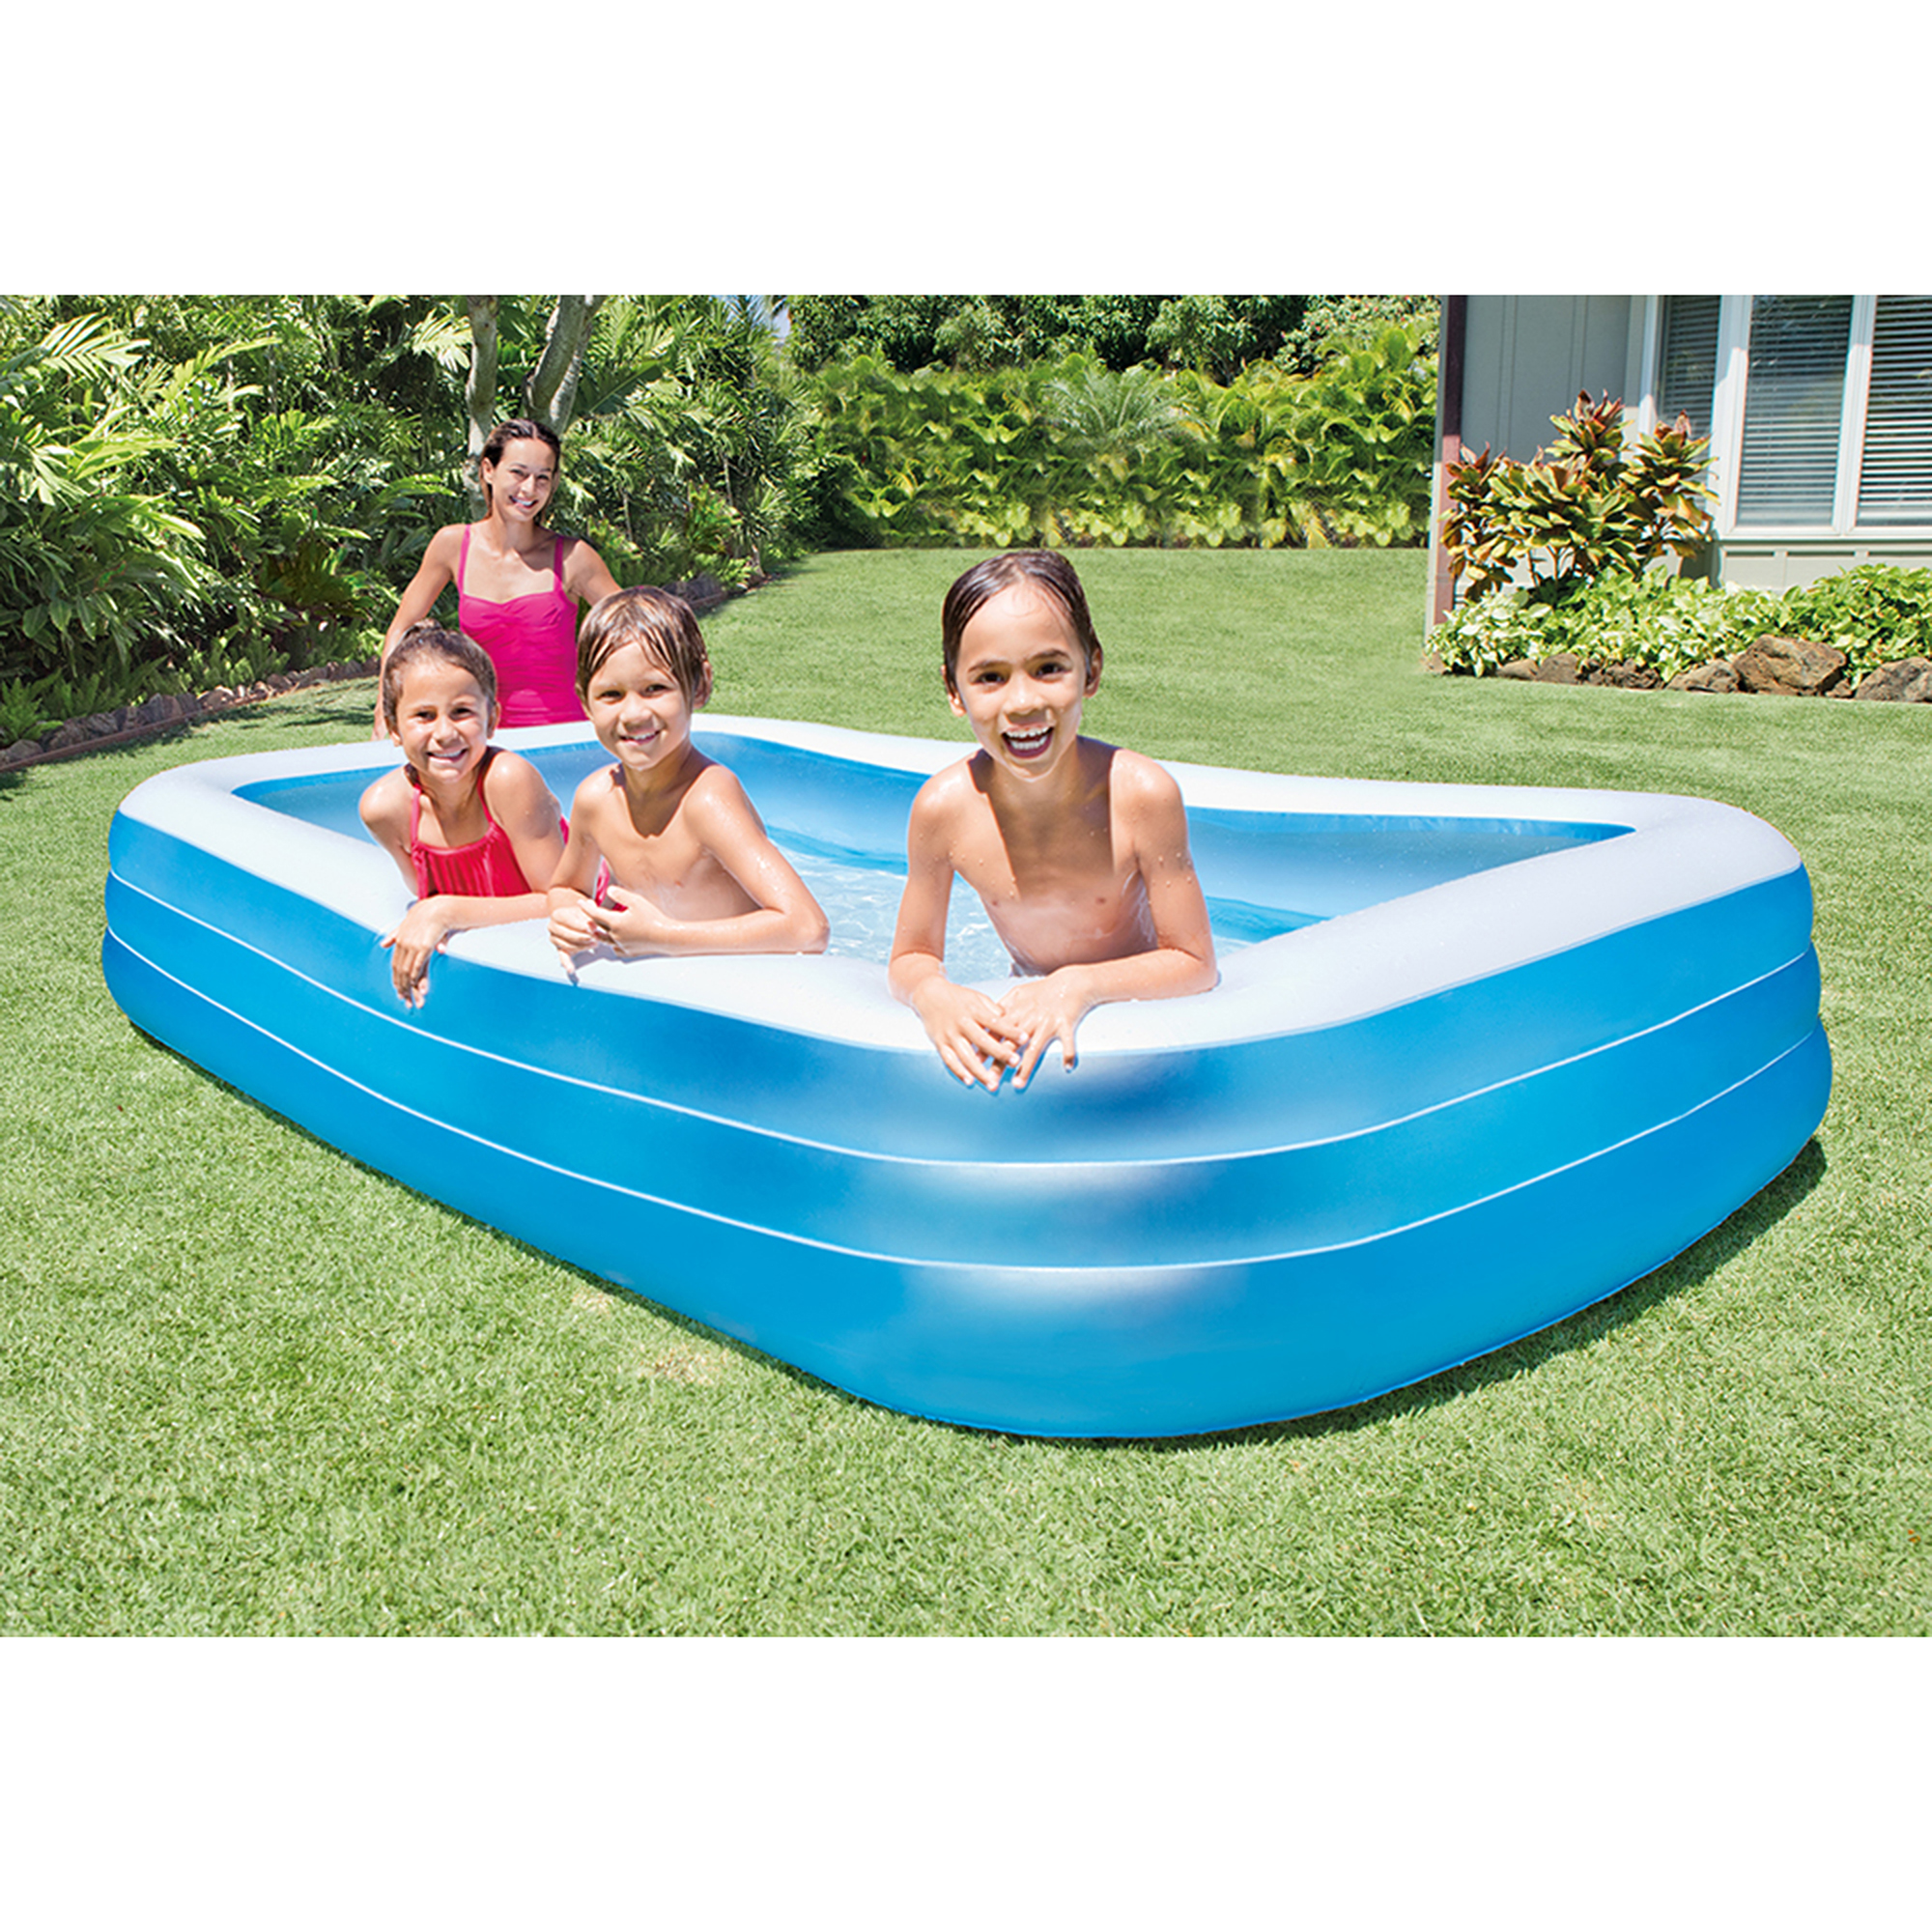 Intex swim center 72 x 120 family backyard inflatable for Intex pool 120 hoch